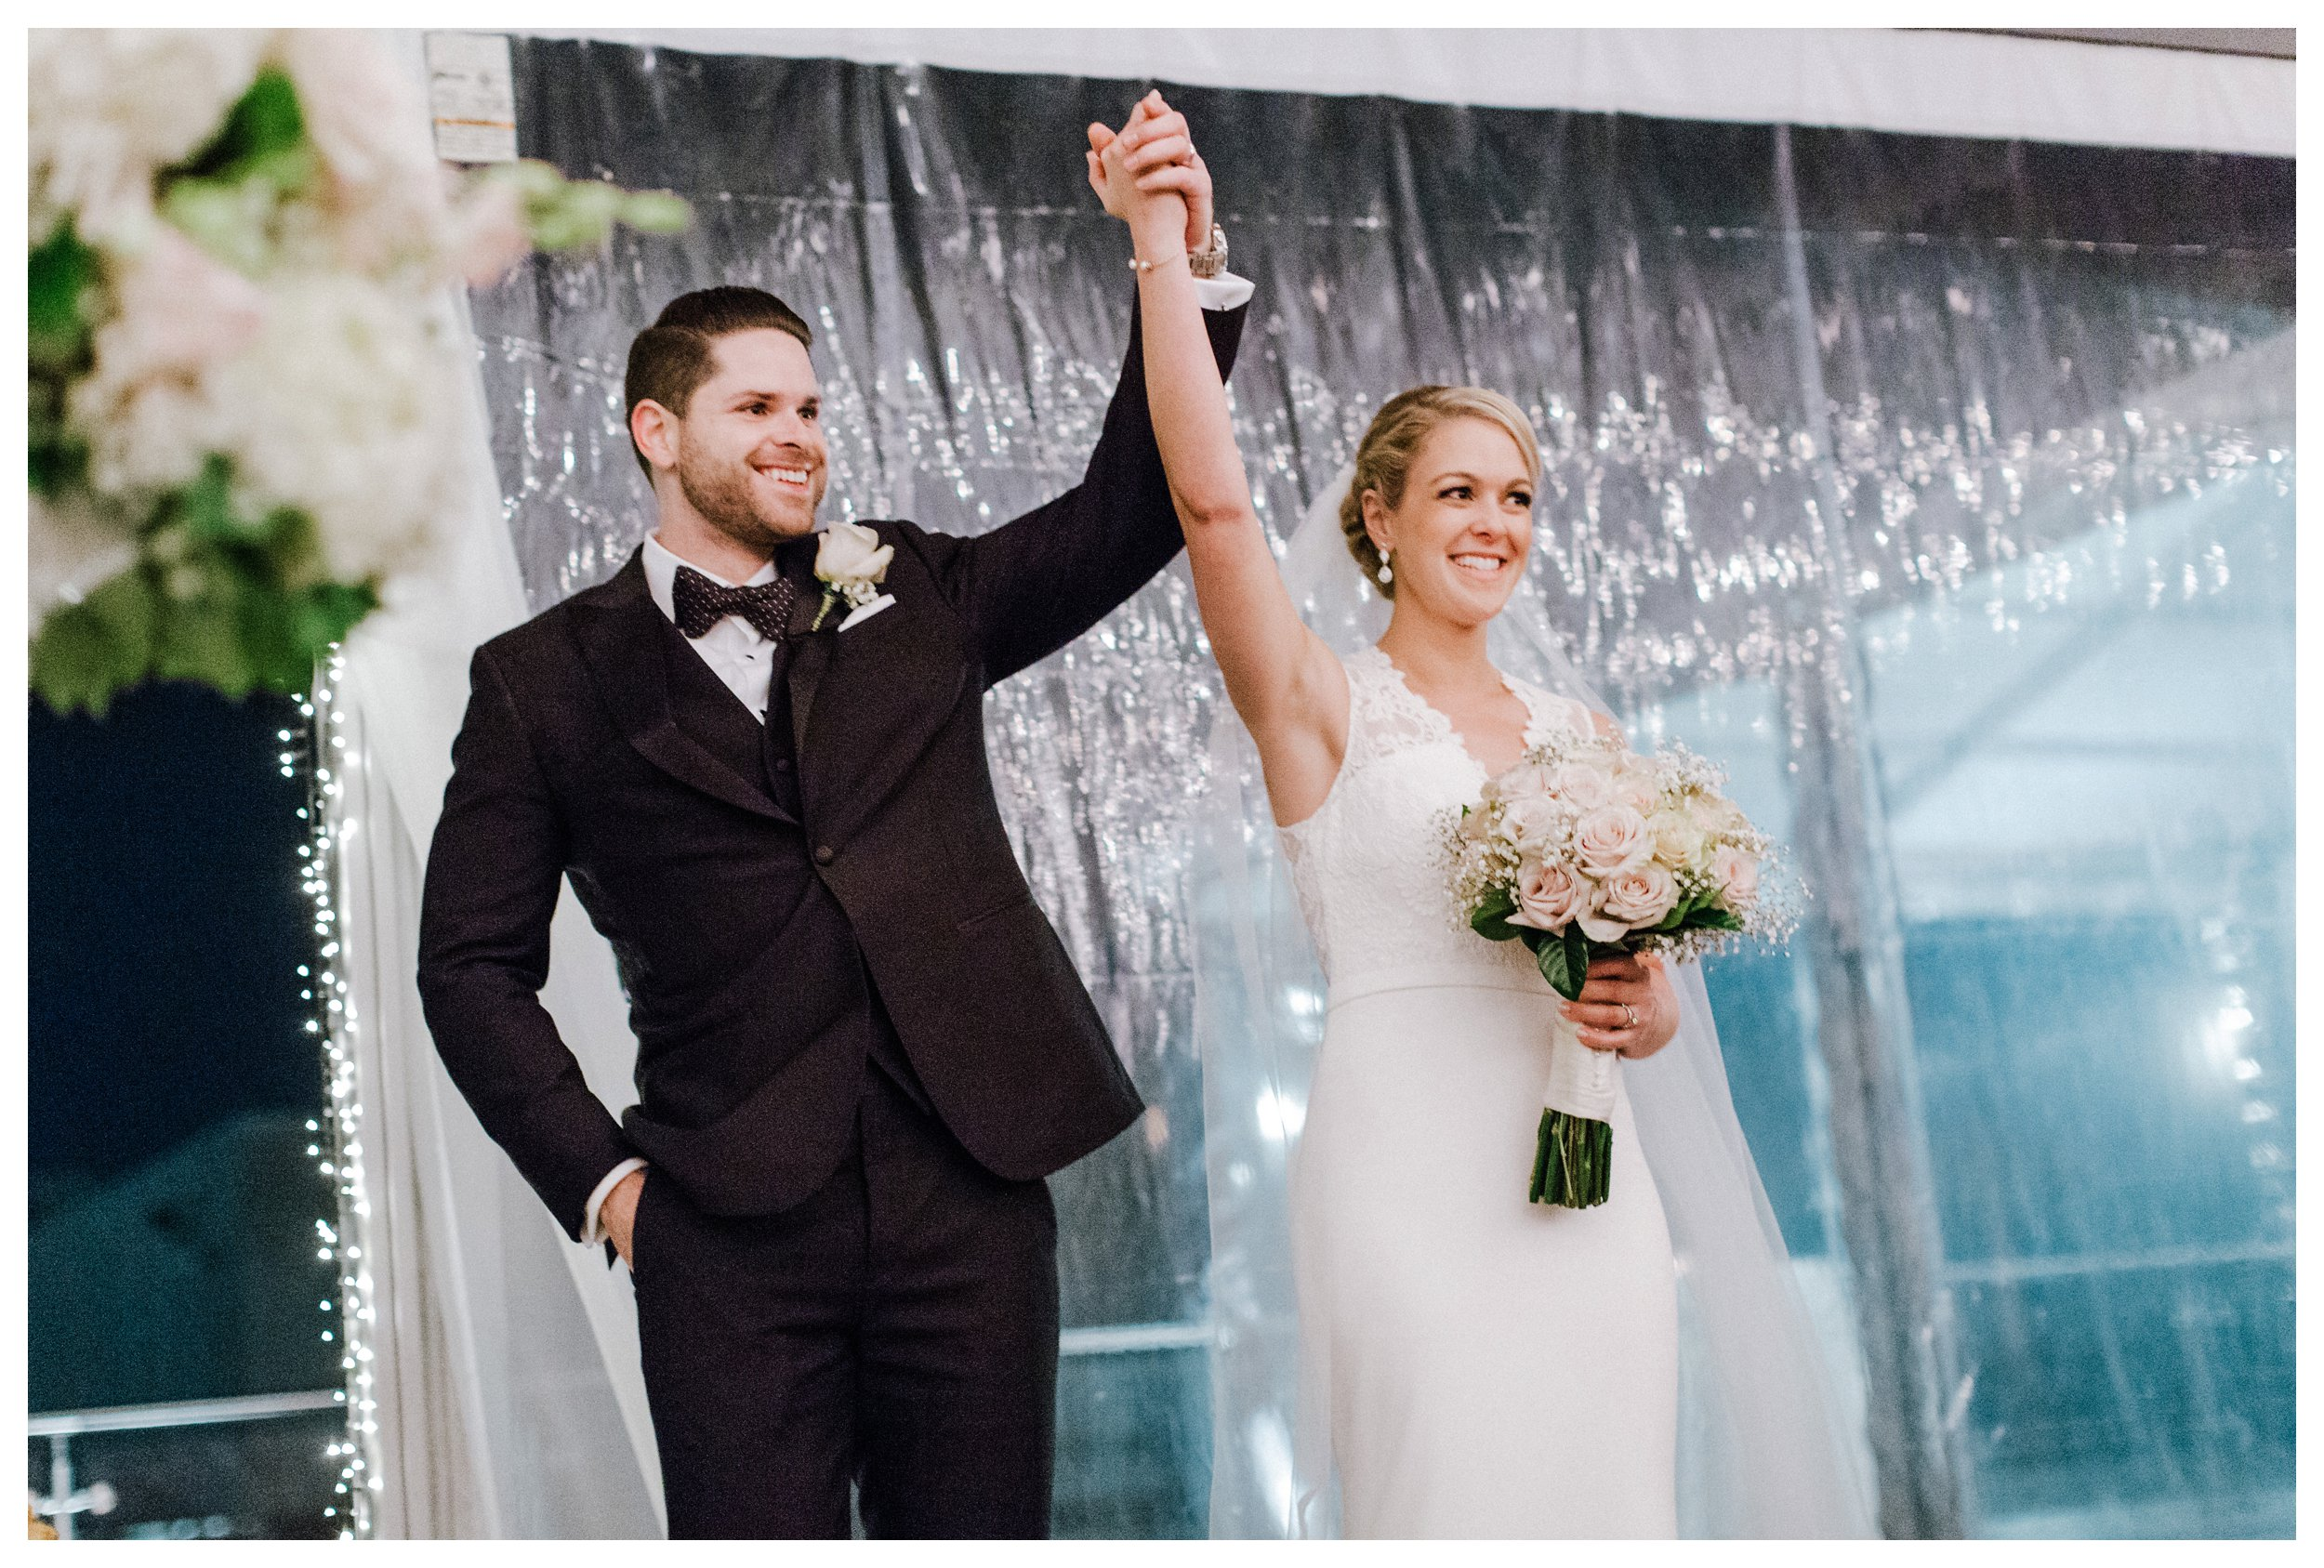 washington-dc-wedding-photographer-44.JPG